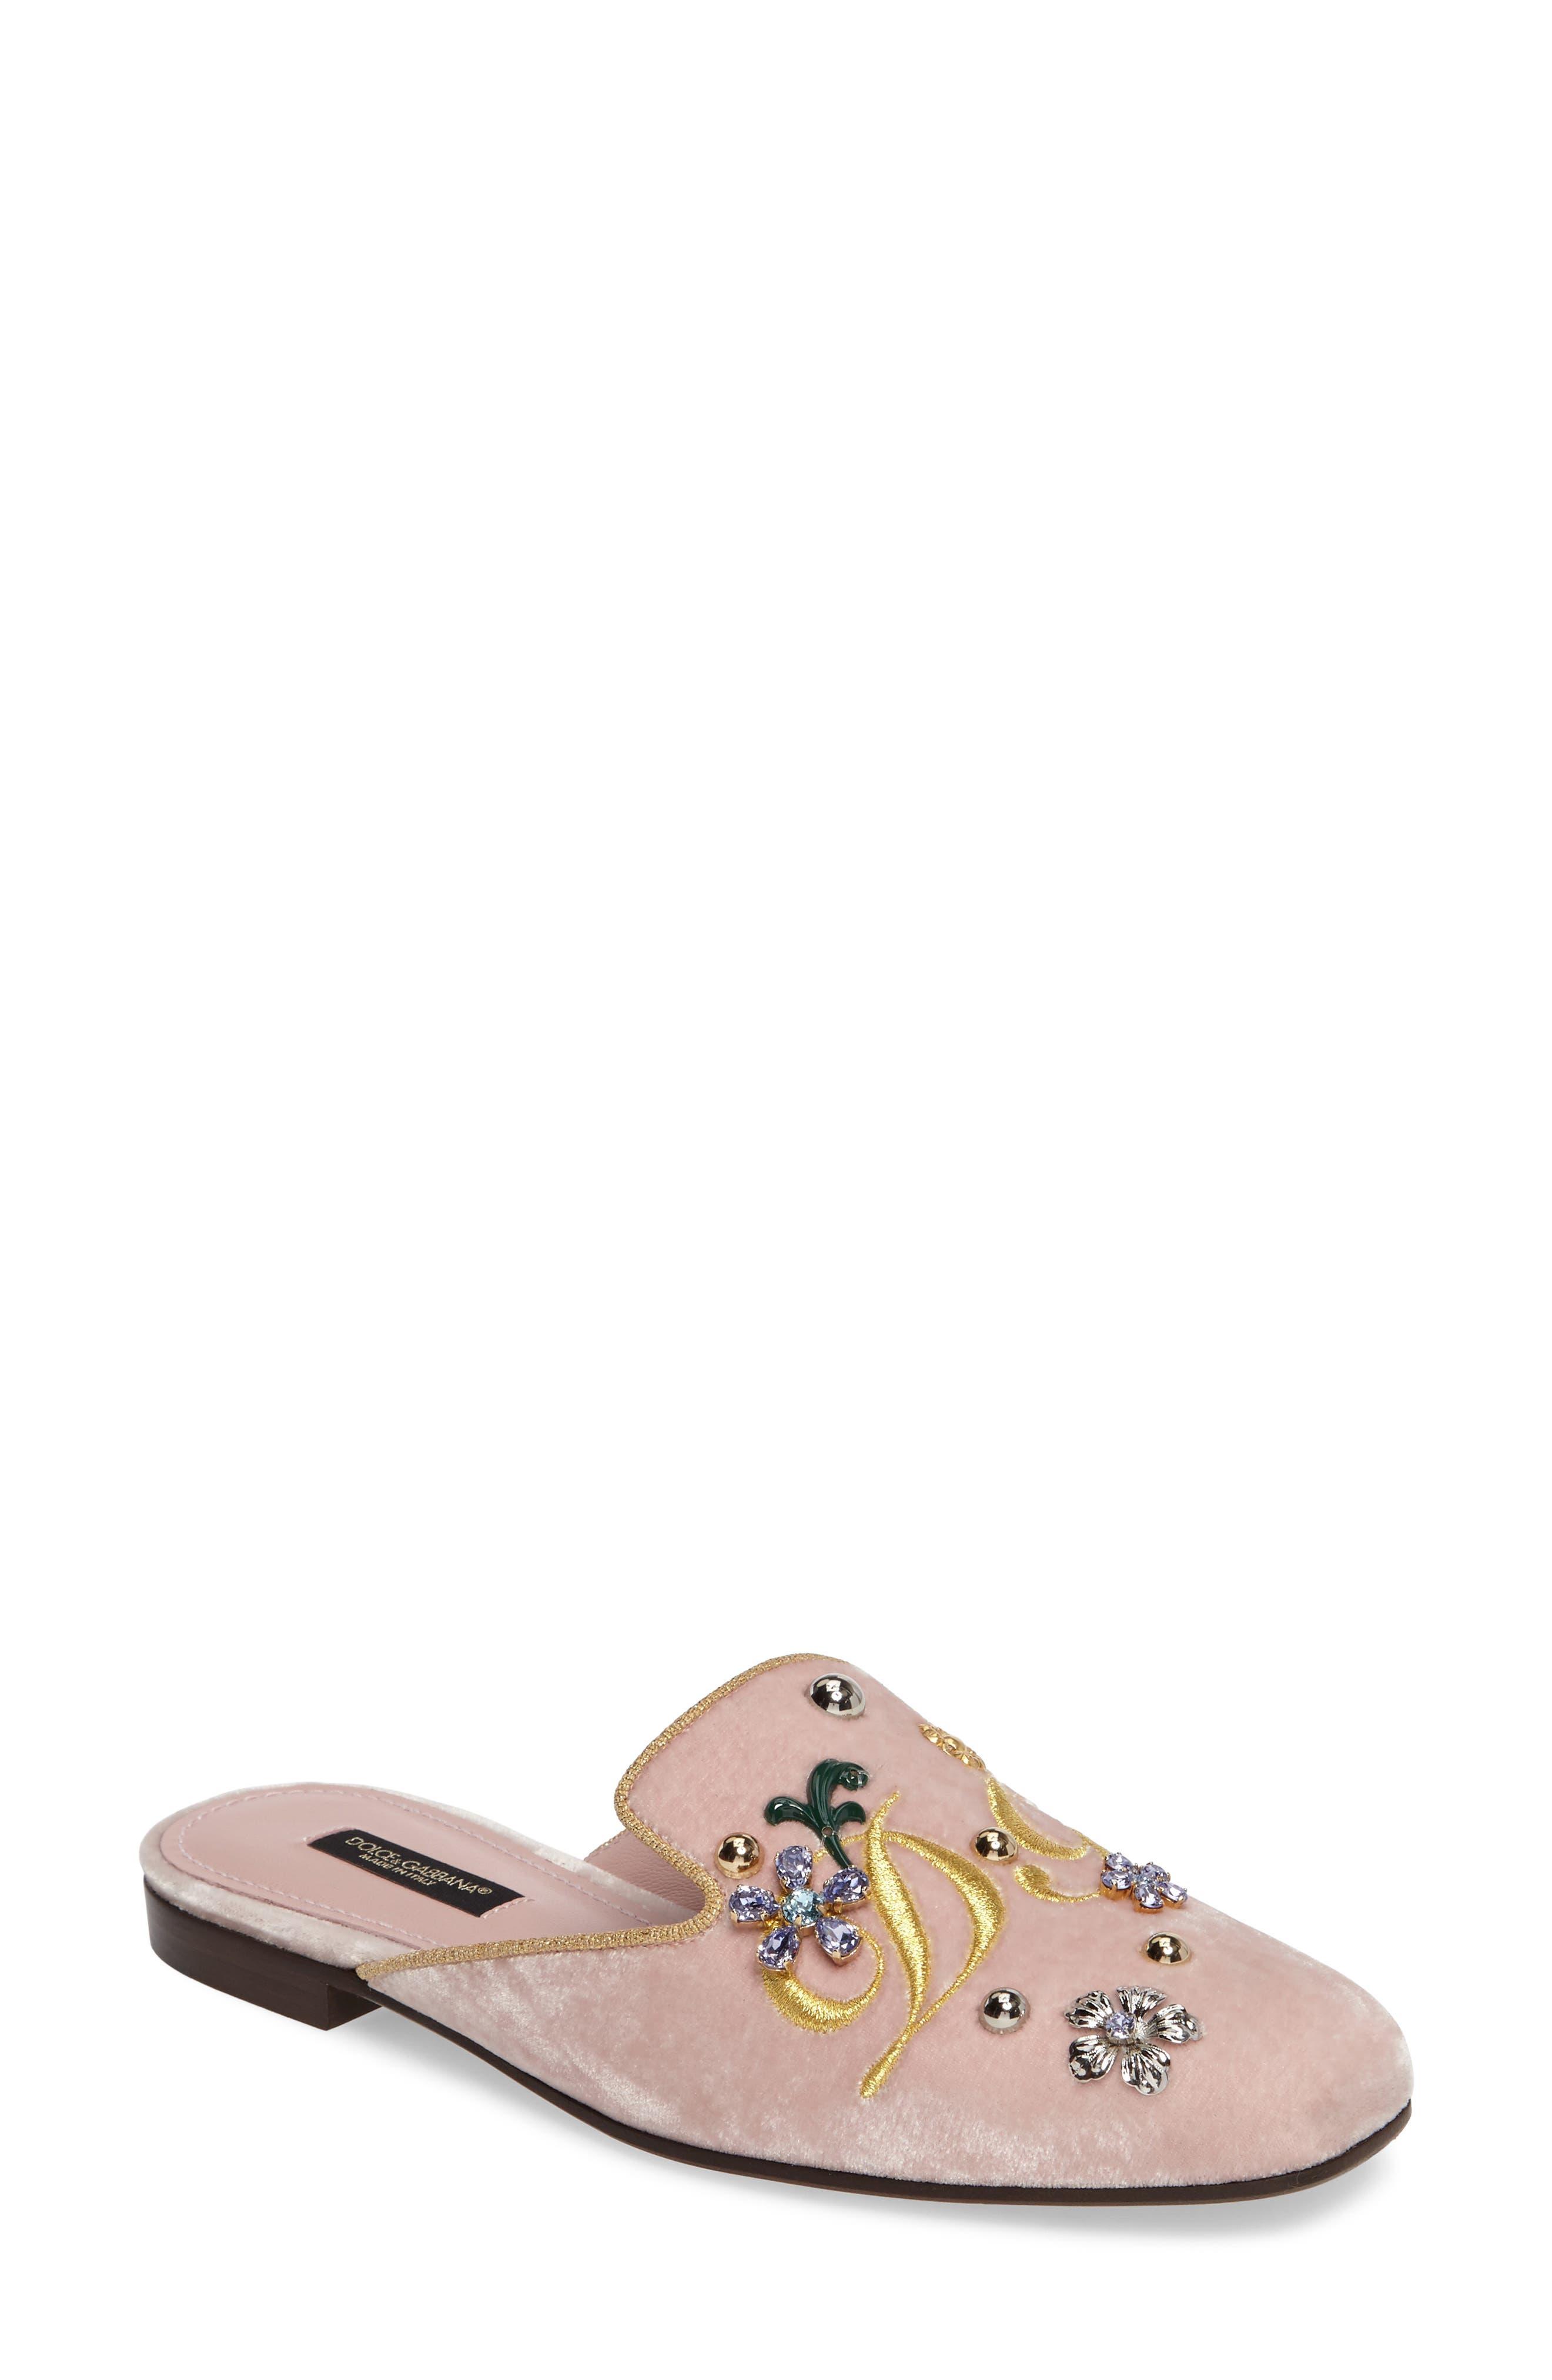 Main Image - Dolce&Gabbana Embellished Velvet Mule (Women)